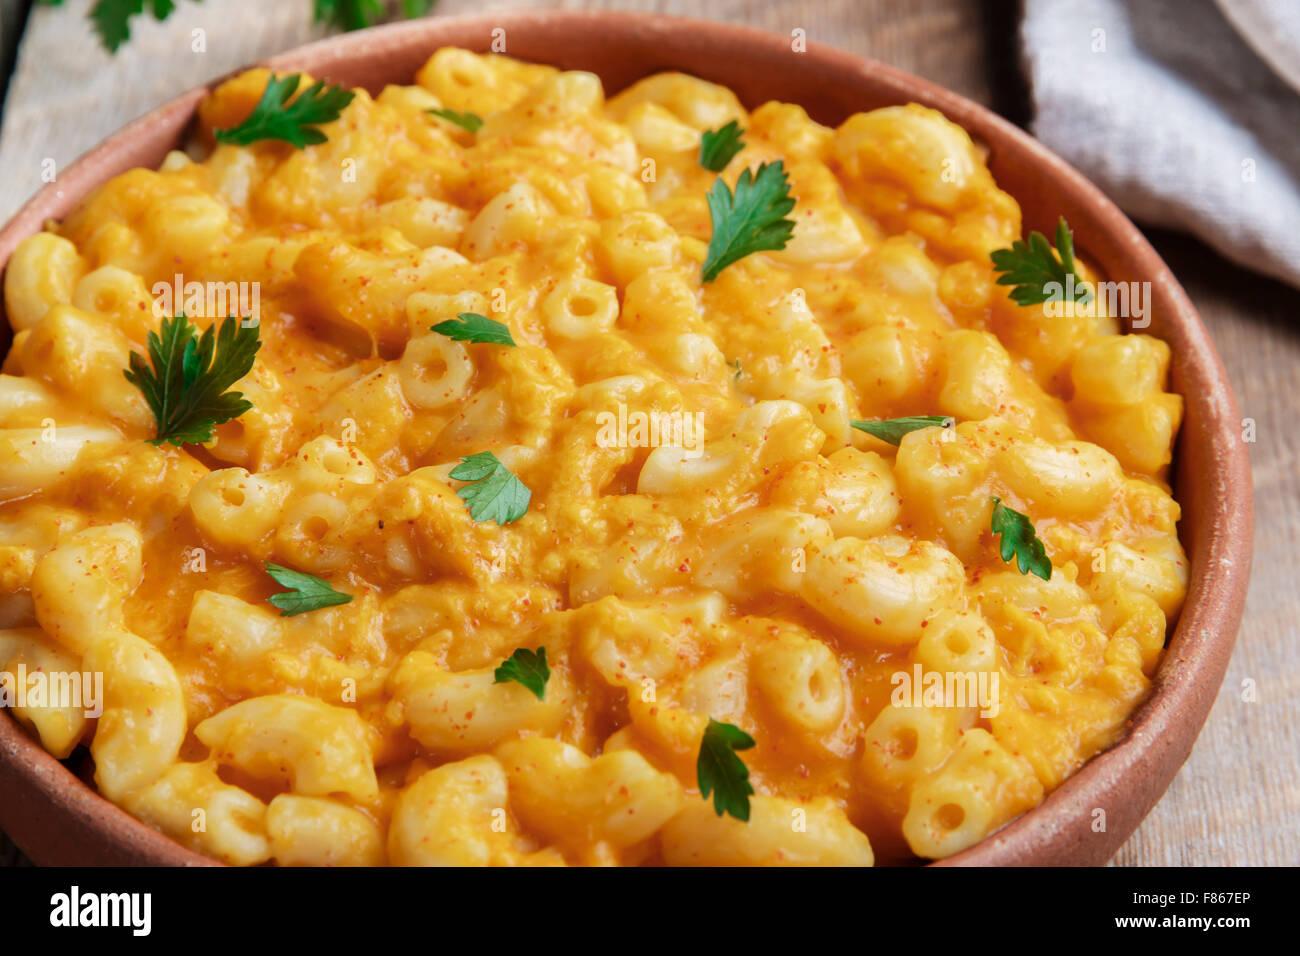 Pasta mit Kürbis und Käse cremig Stockfoto